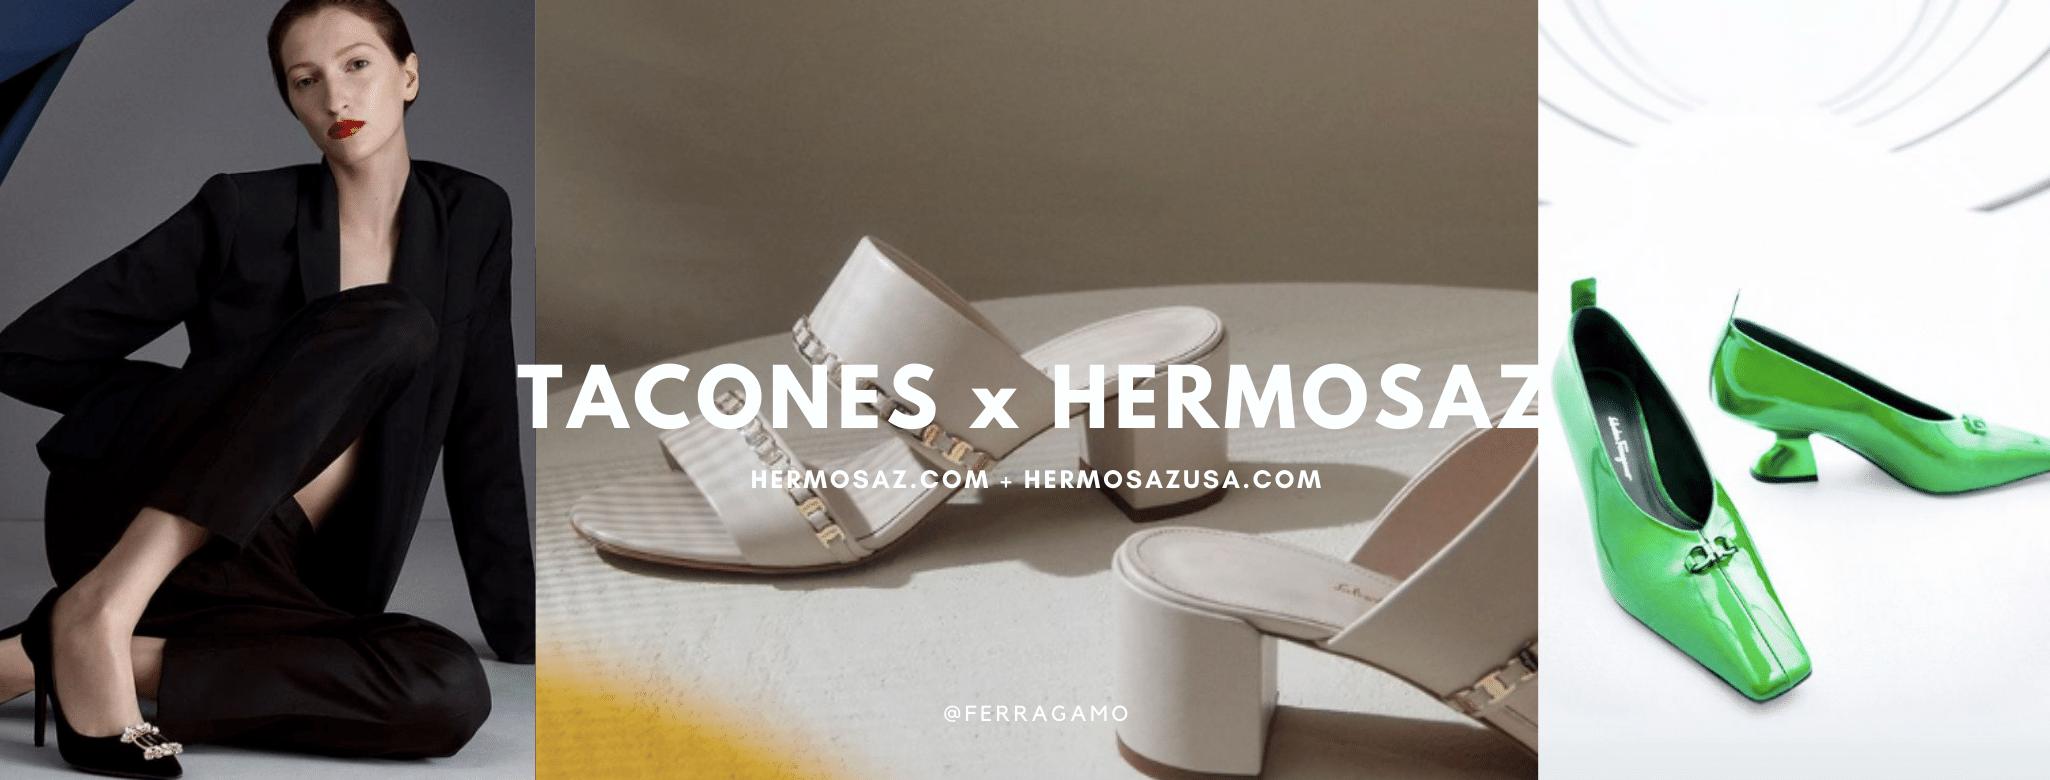 Tacones x Hermosaz